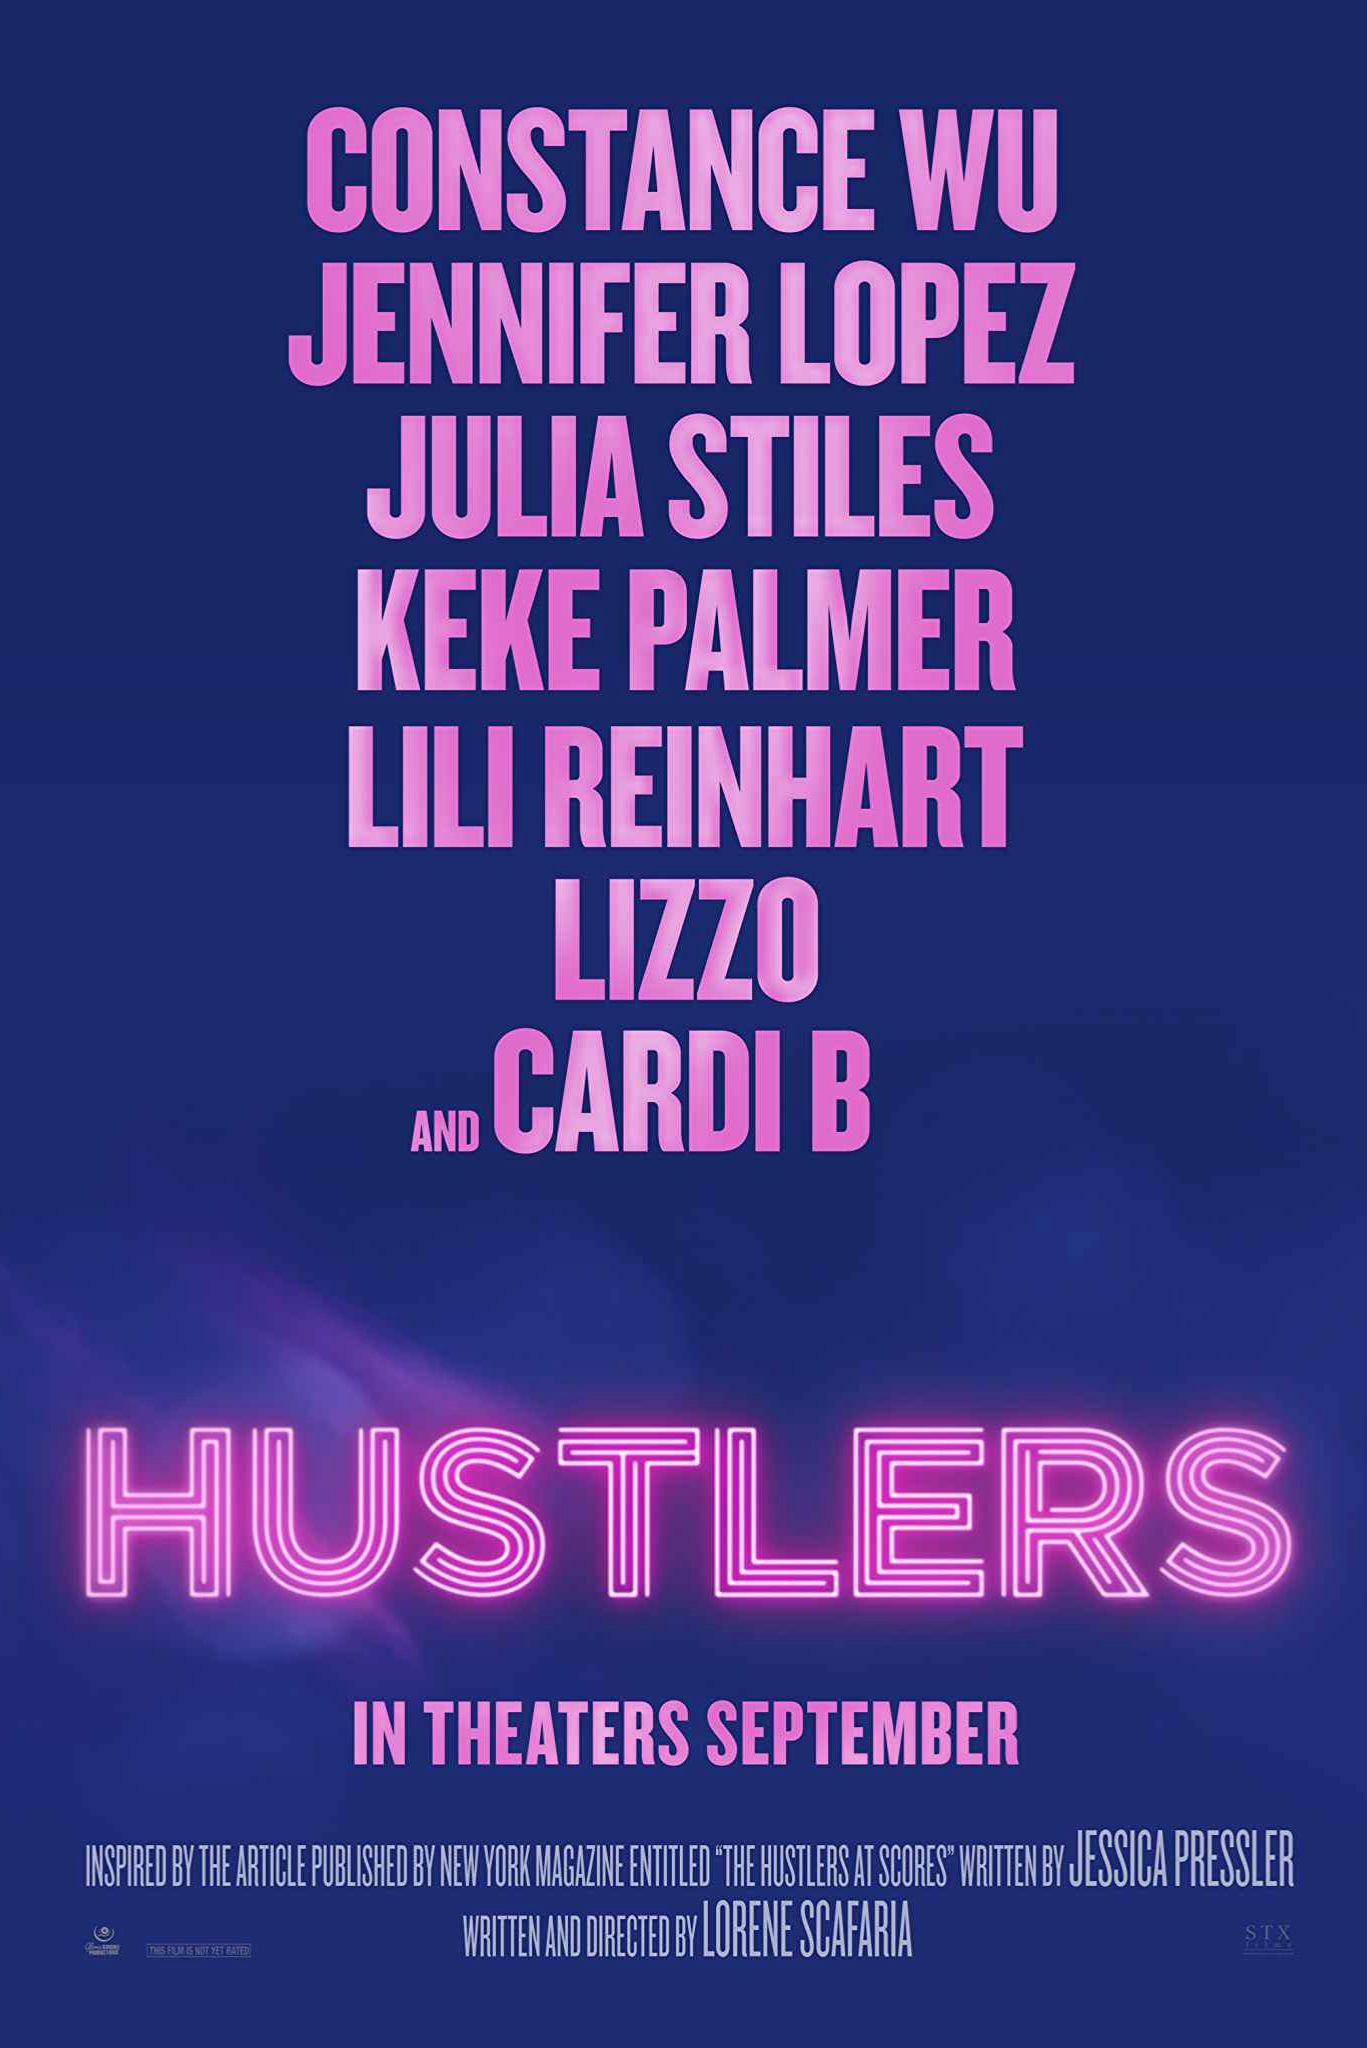 Hustlers 2019 Hd 1080p